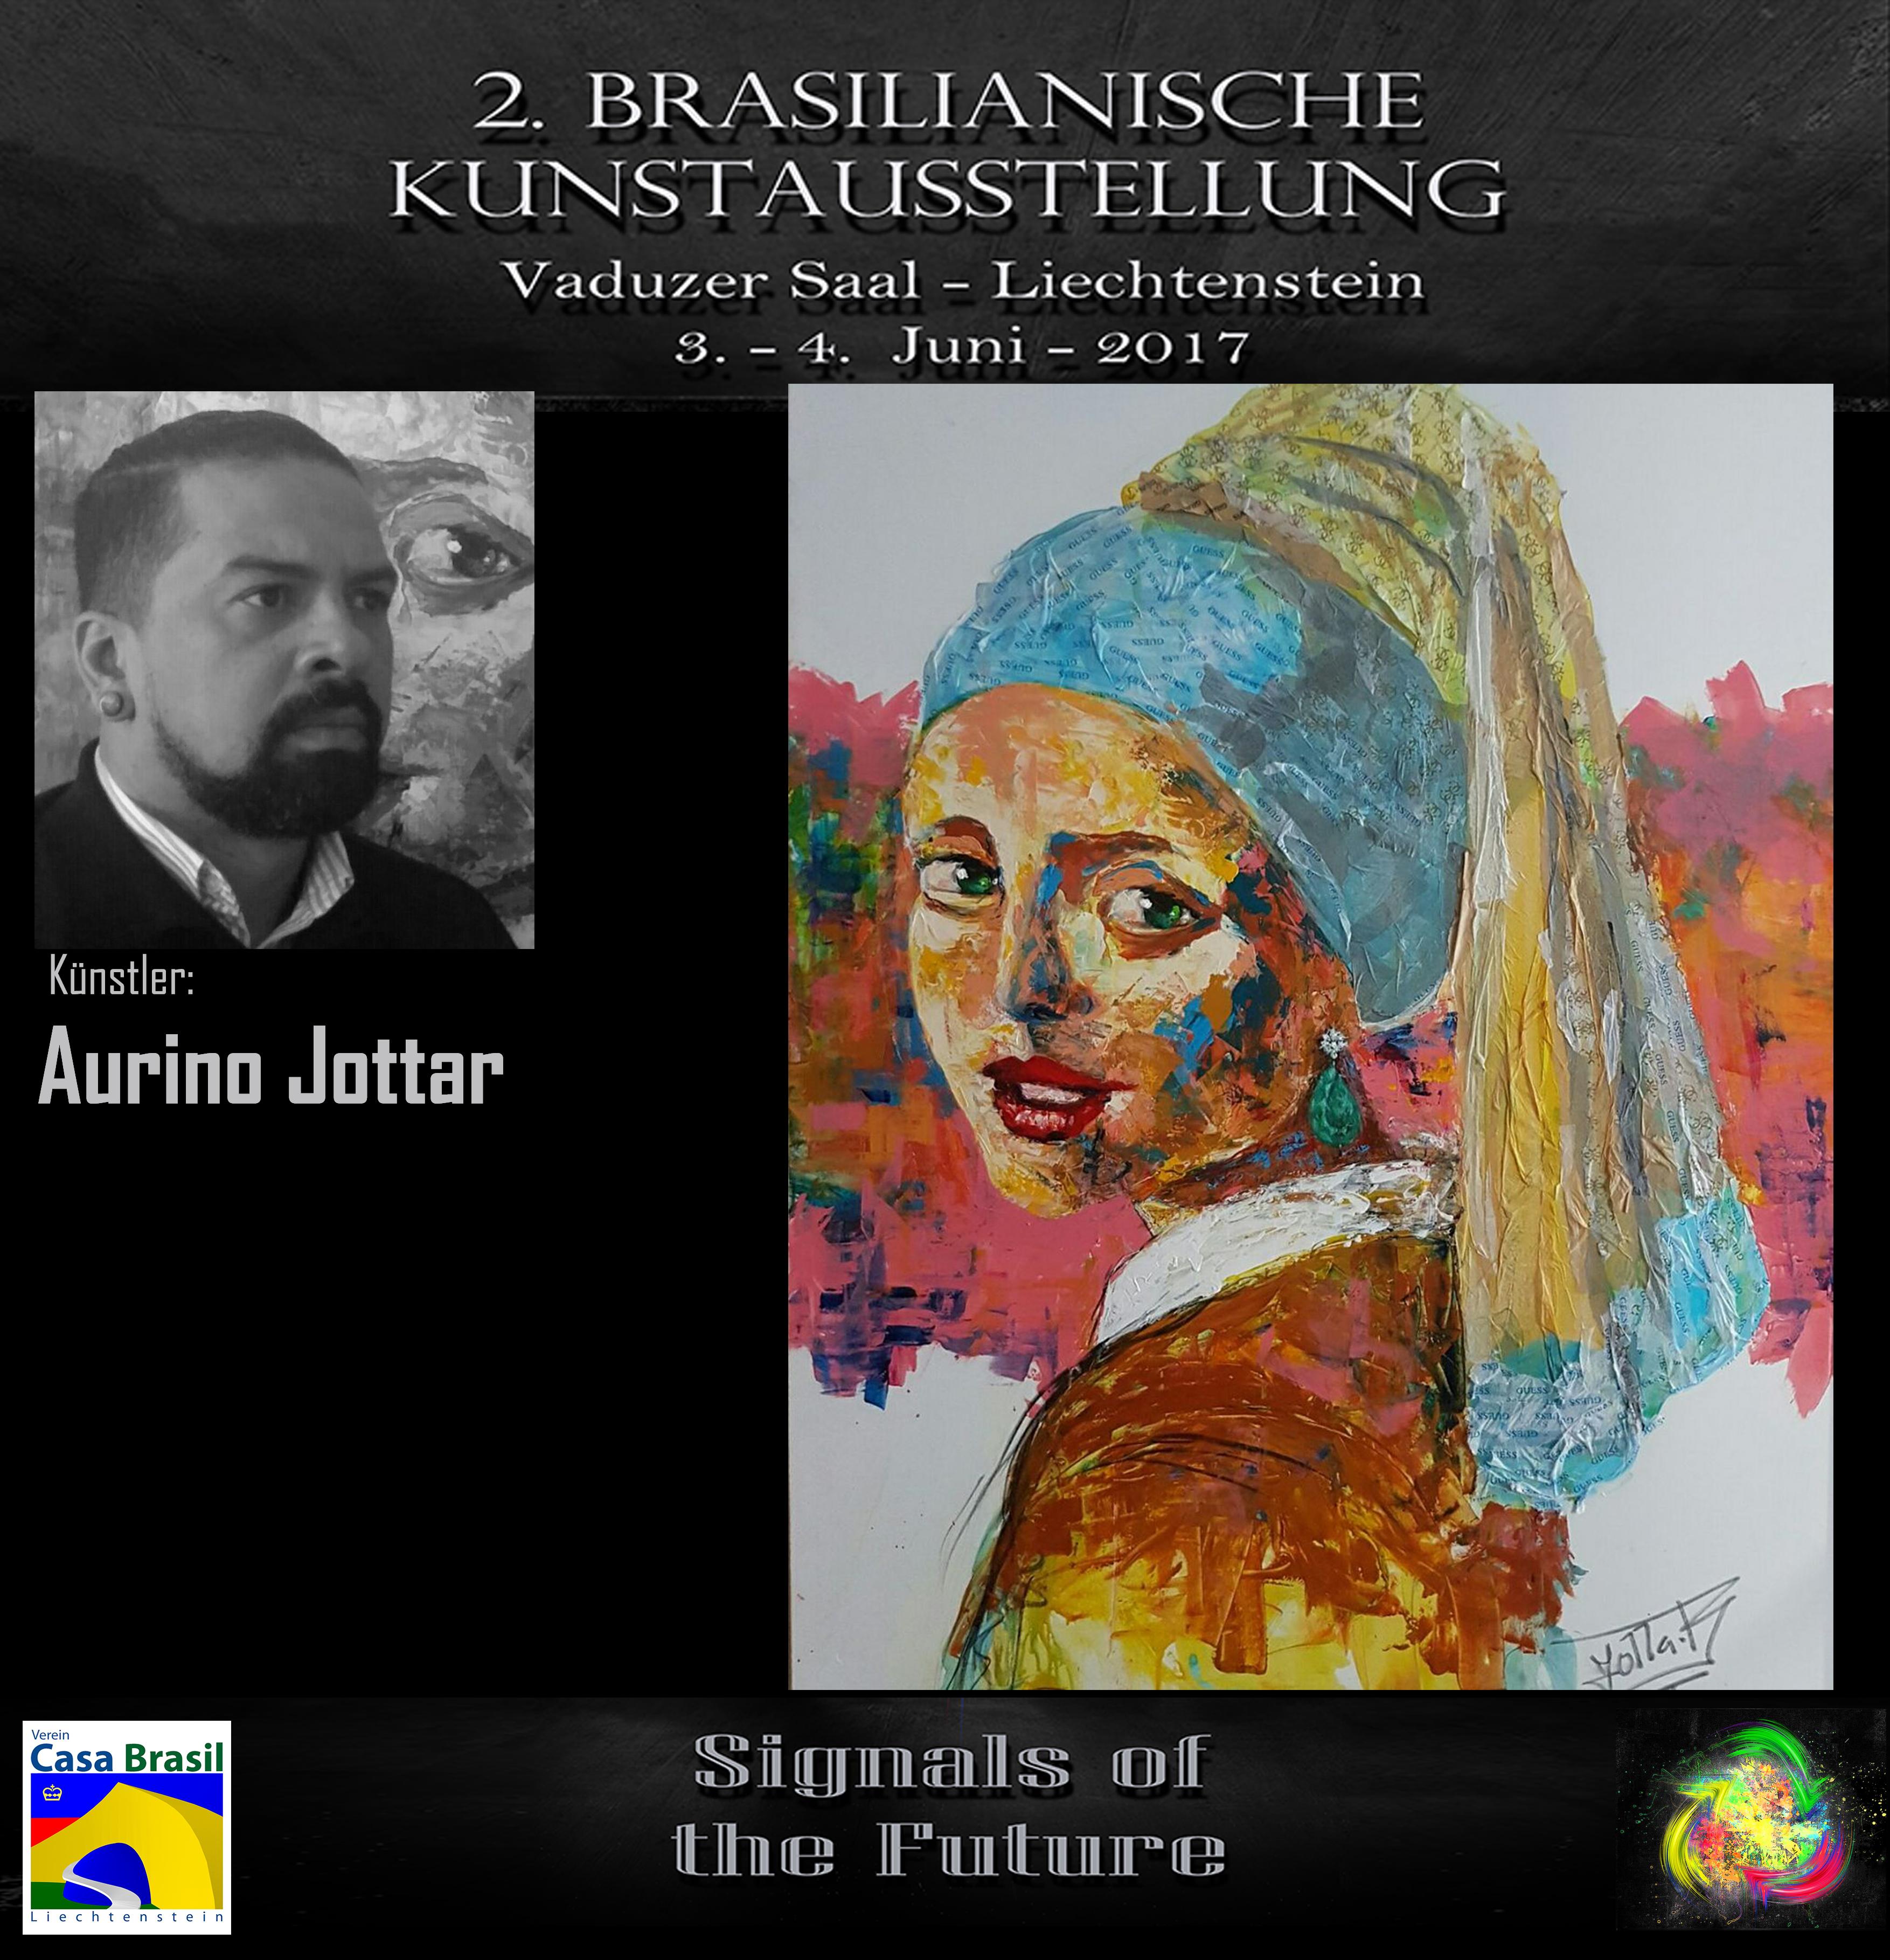 Aurino Jottar